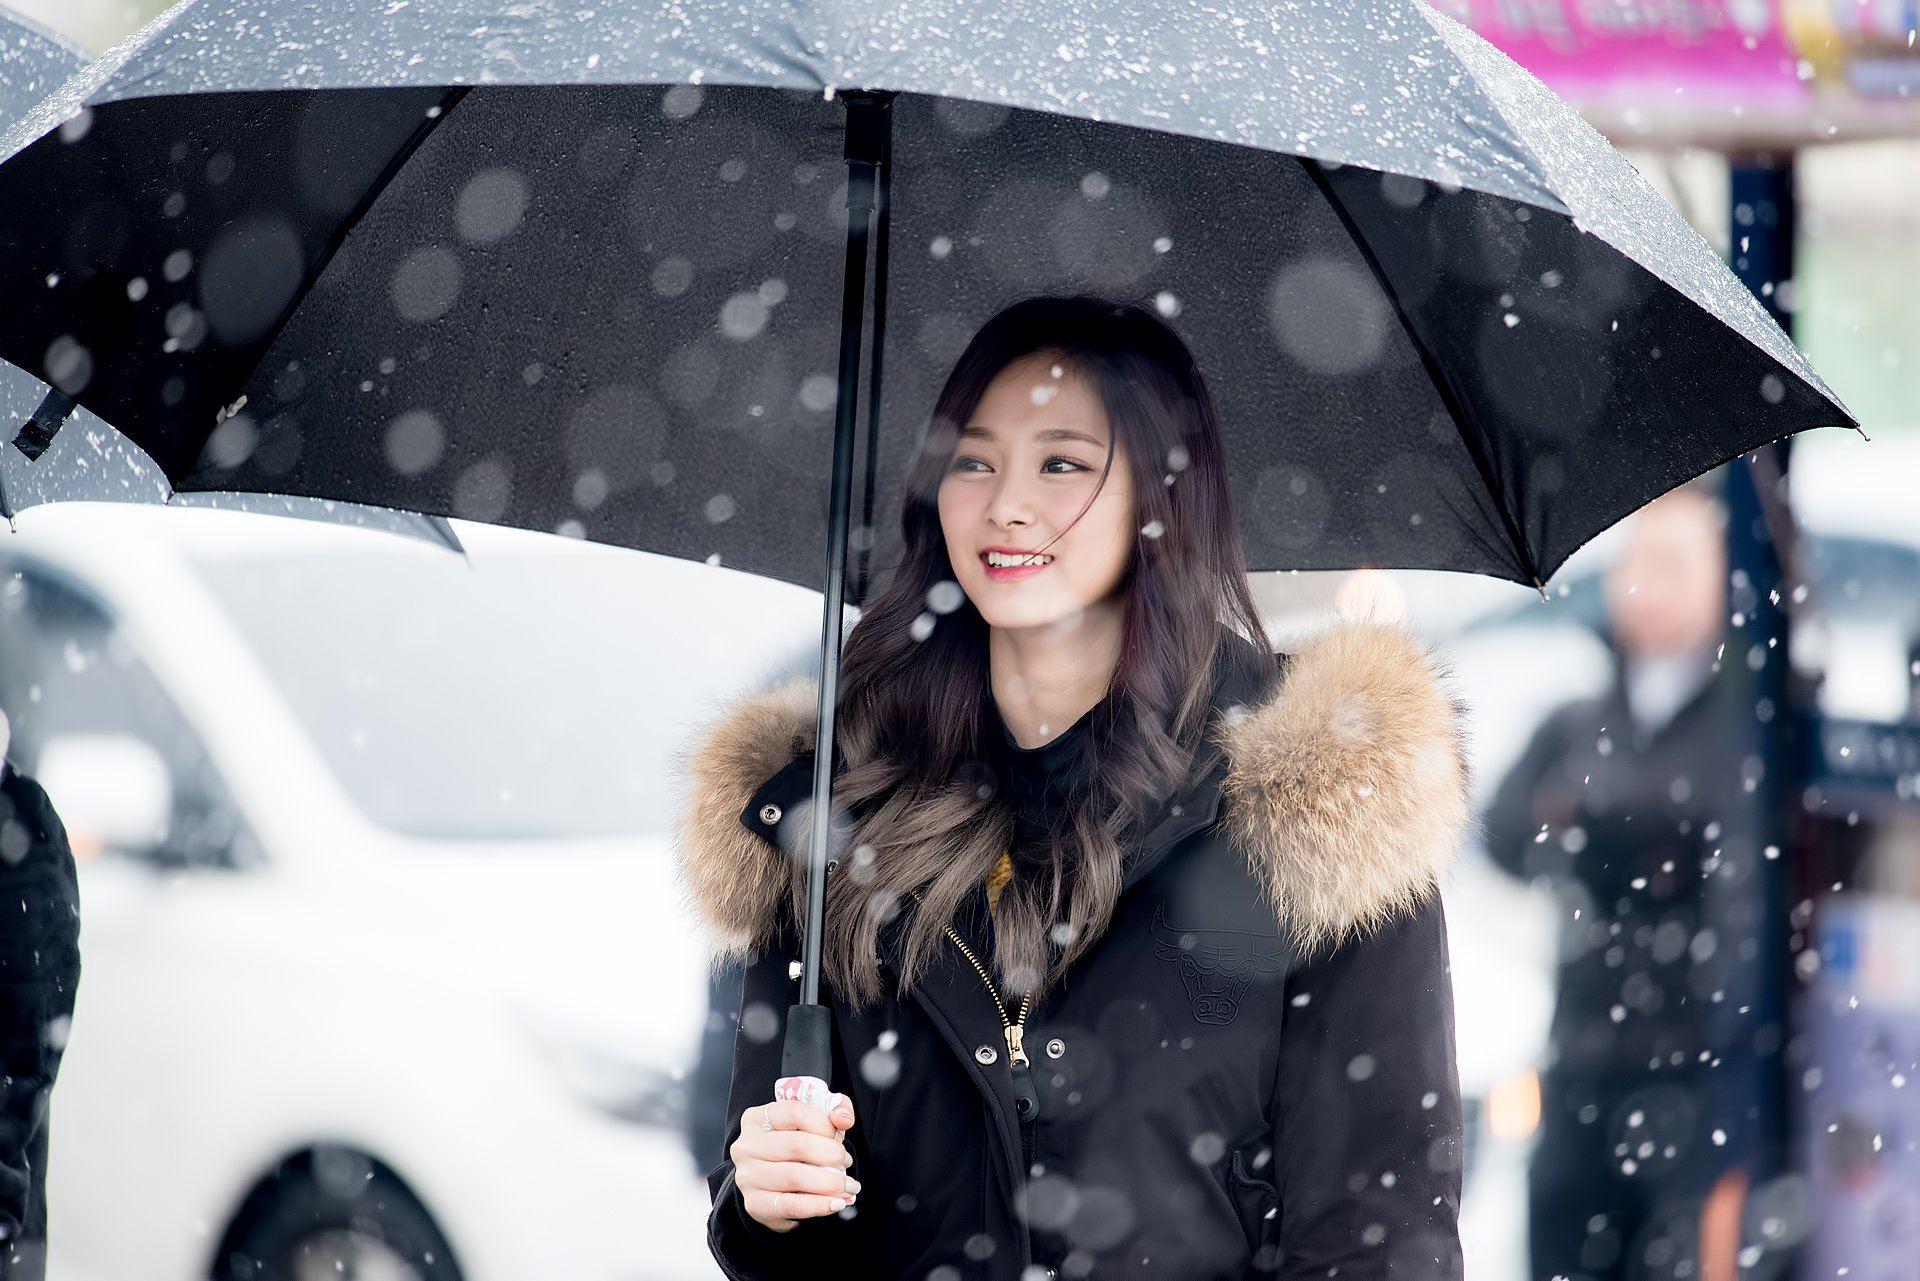 Fans capture heartwarming photos of TWICE during Korea's first snowfall - Koreaboo